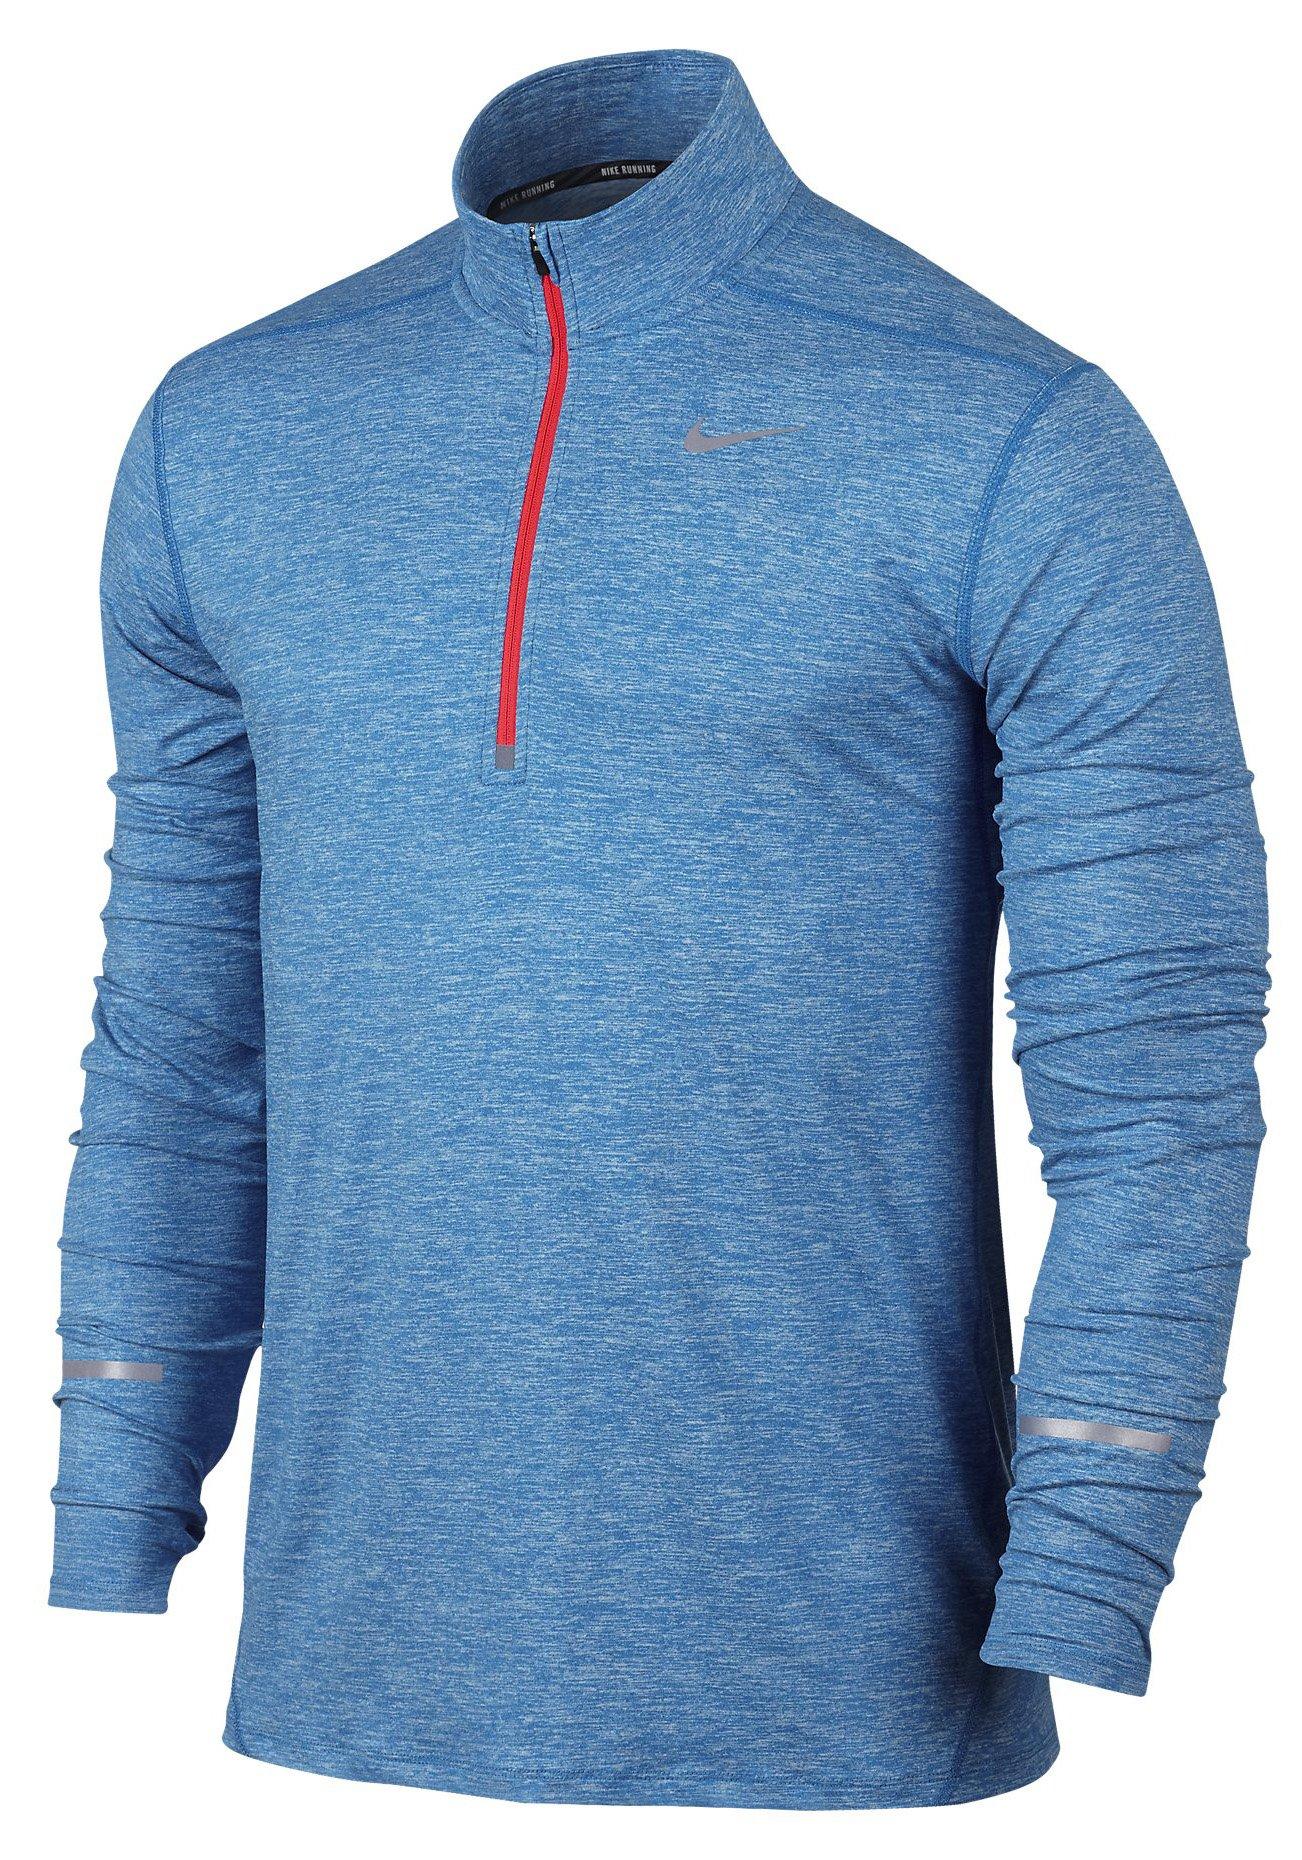 Tričko s dlouhým rukávem Nike Dri-FIT Element